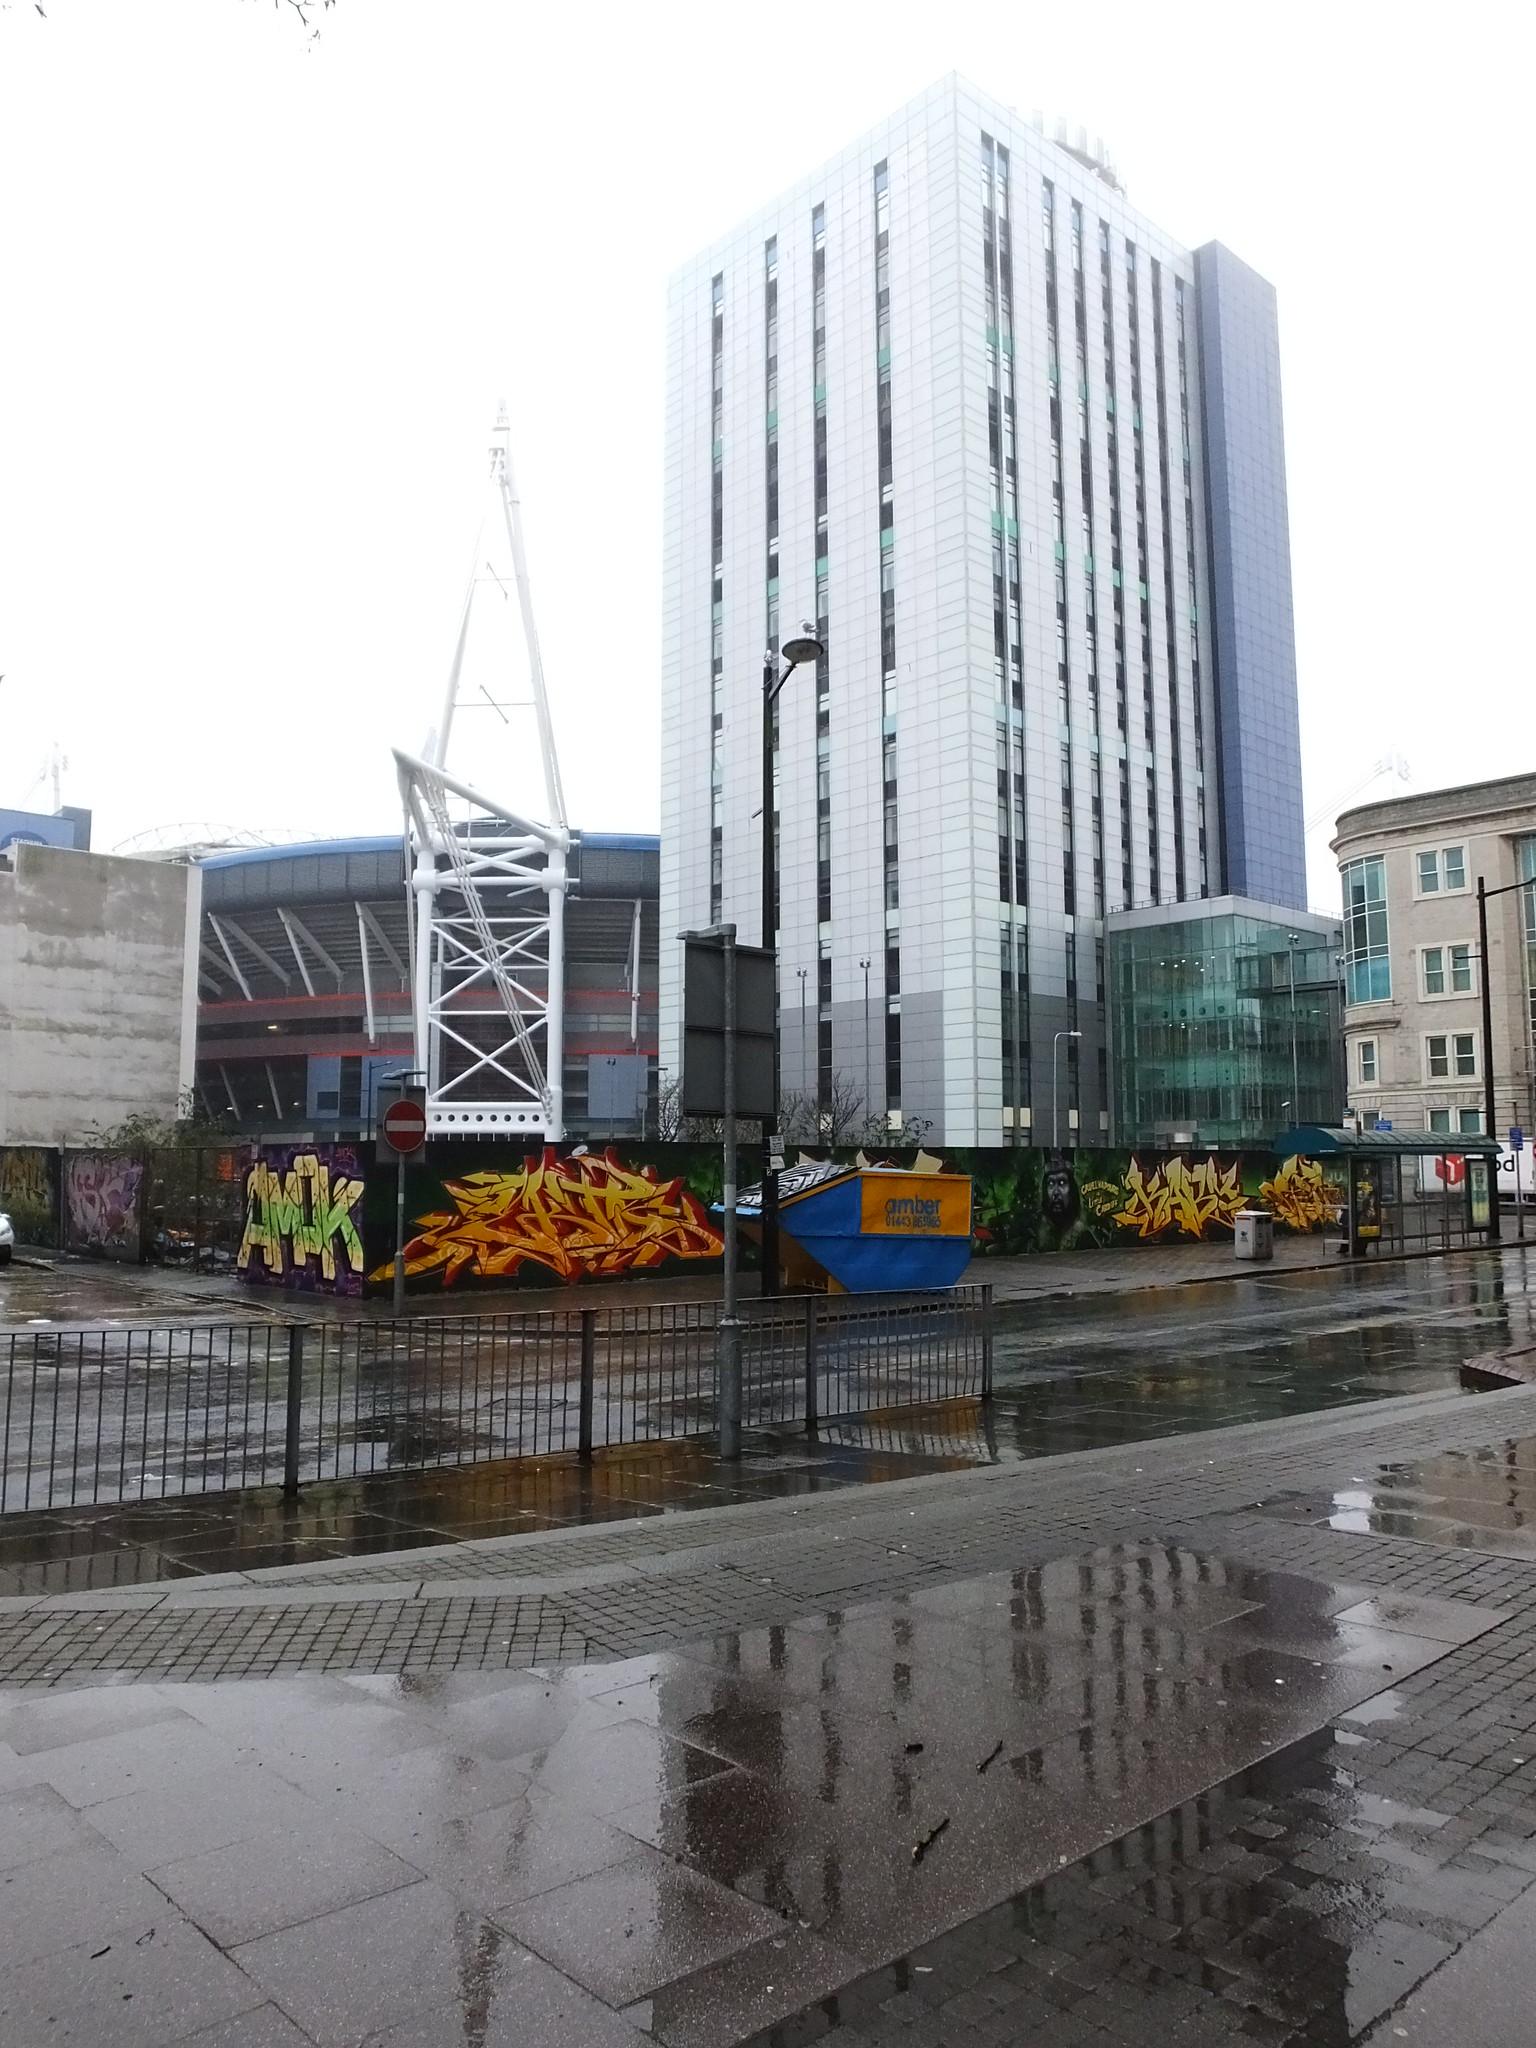 Street art, Park Street Cardiff